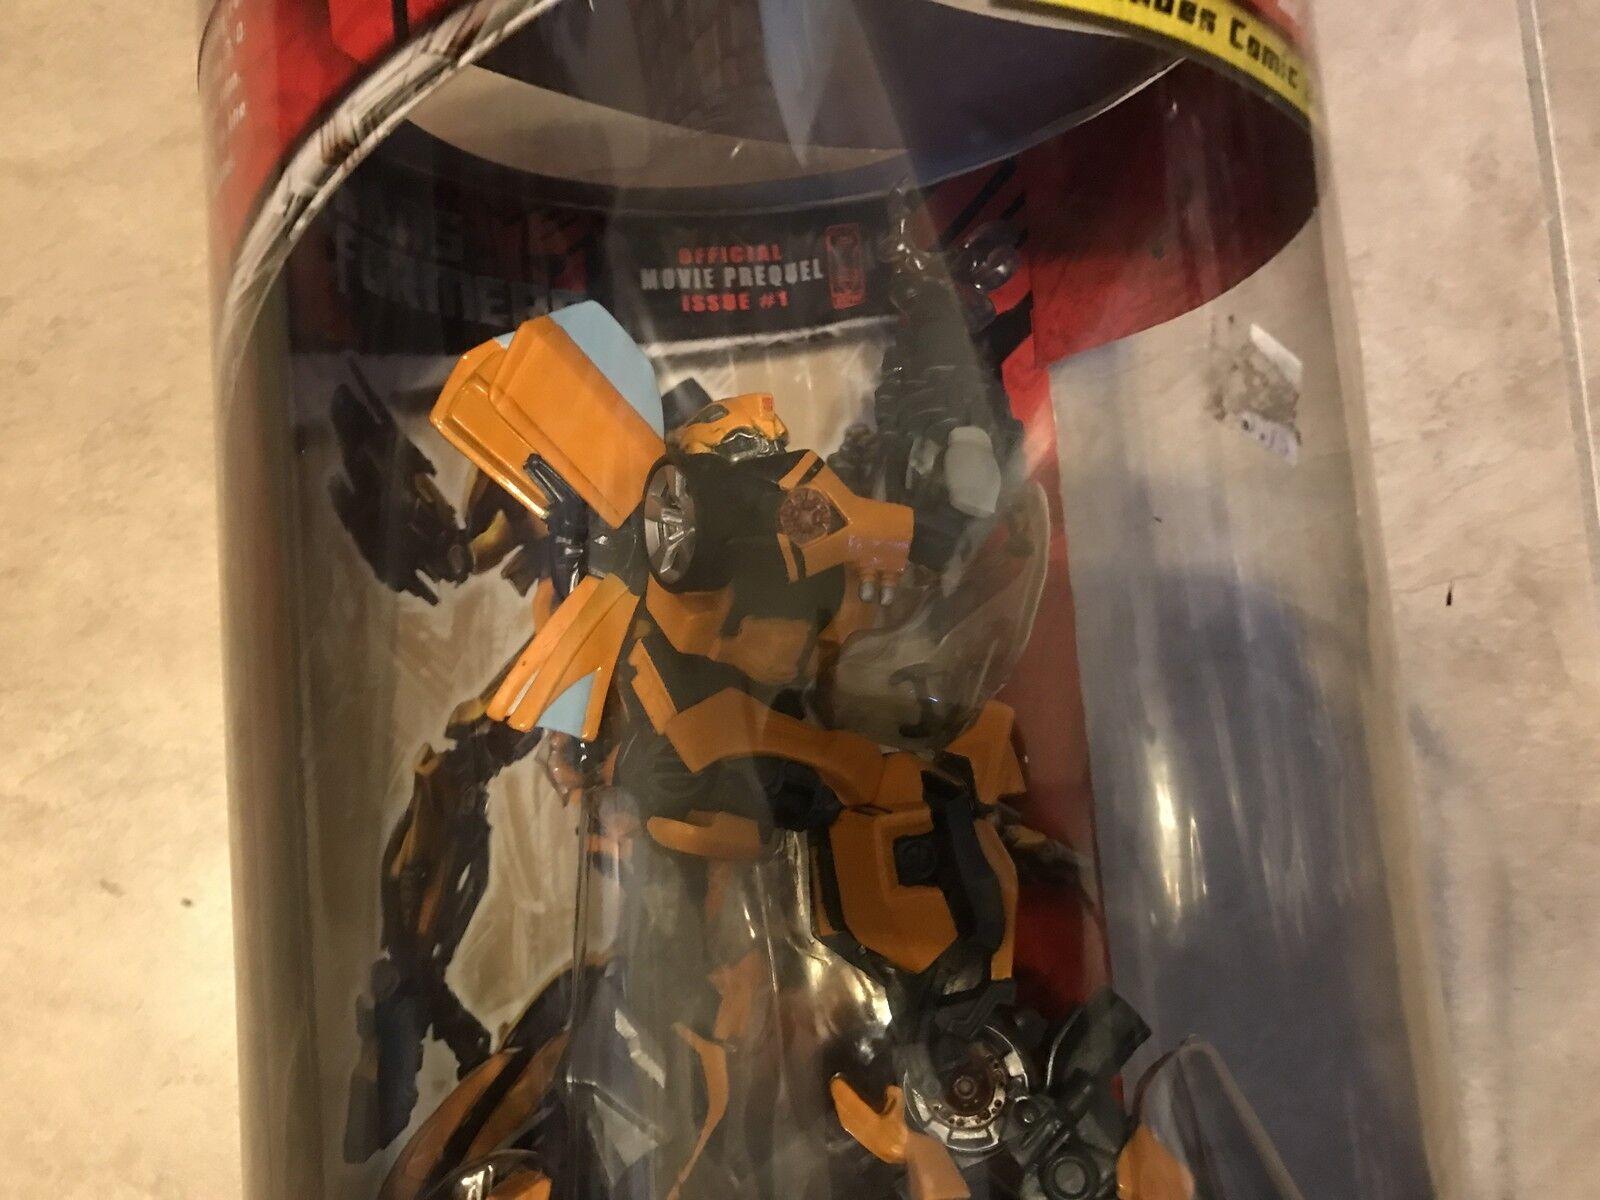 Transformers Bumblebee Autobot Unleashed w  Exclusive Comic Book Figure Figure Figure NEW 4c7672